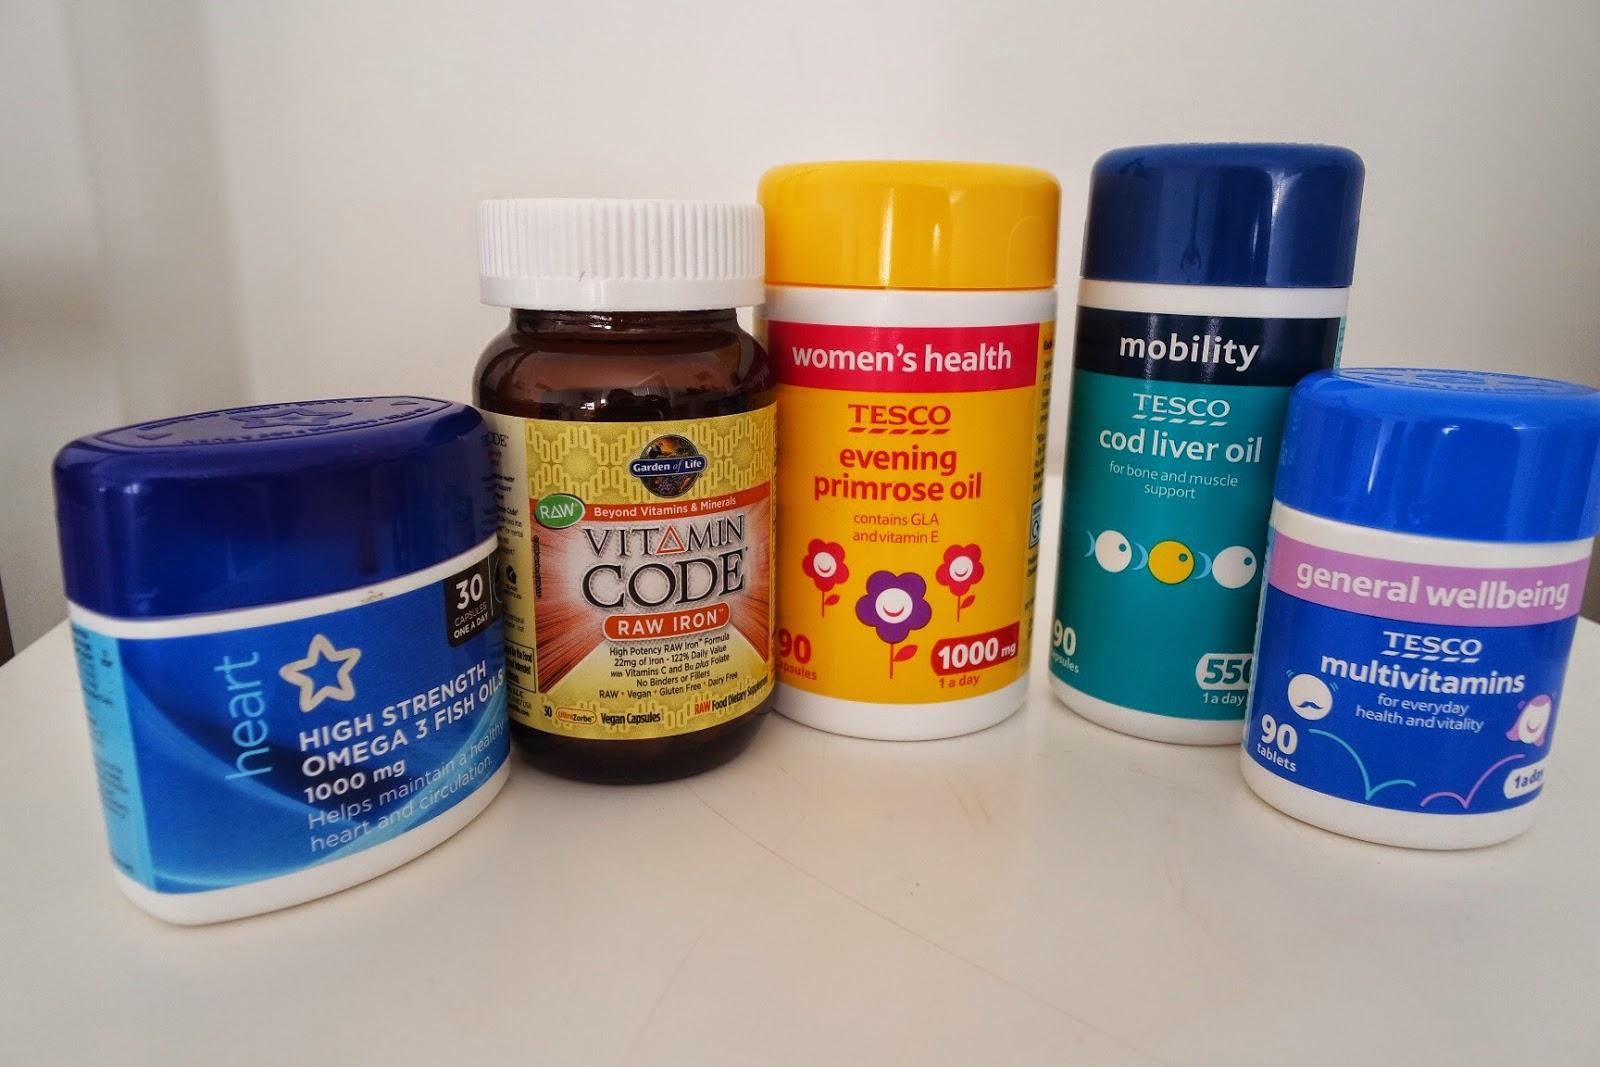 health, vitamins, life,